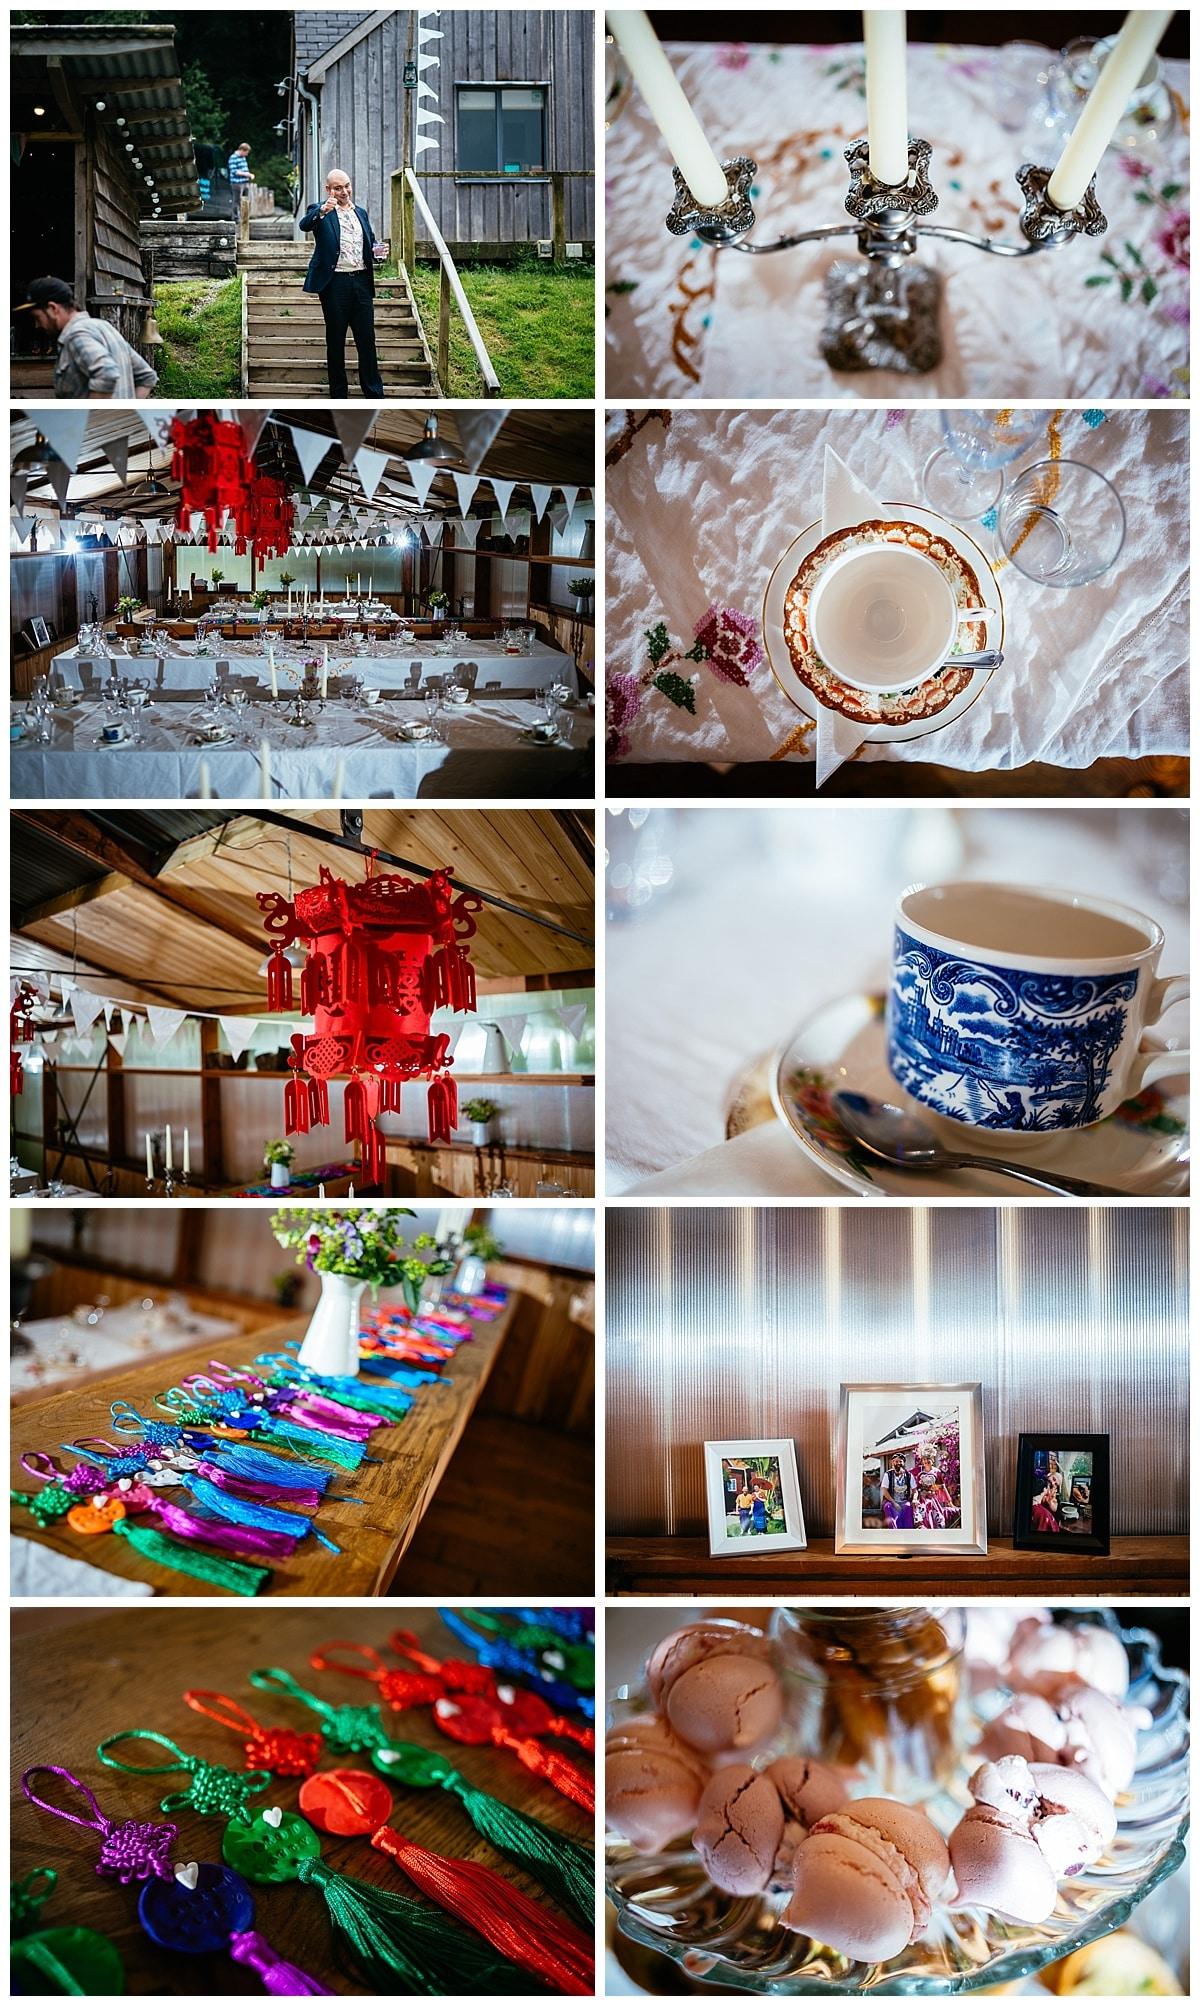 Alternative Humanist Wedding at Fforest Pembrokeshire, Wales